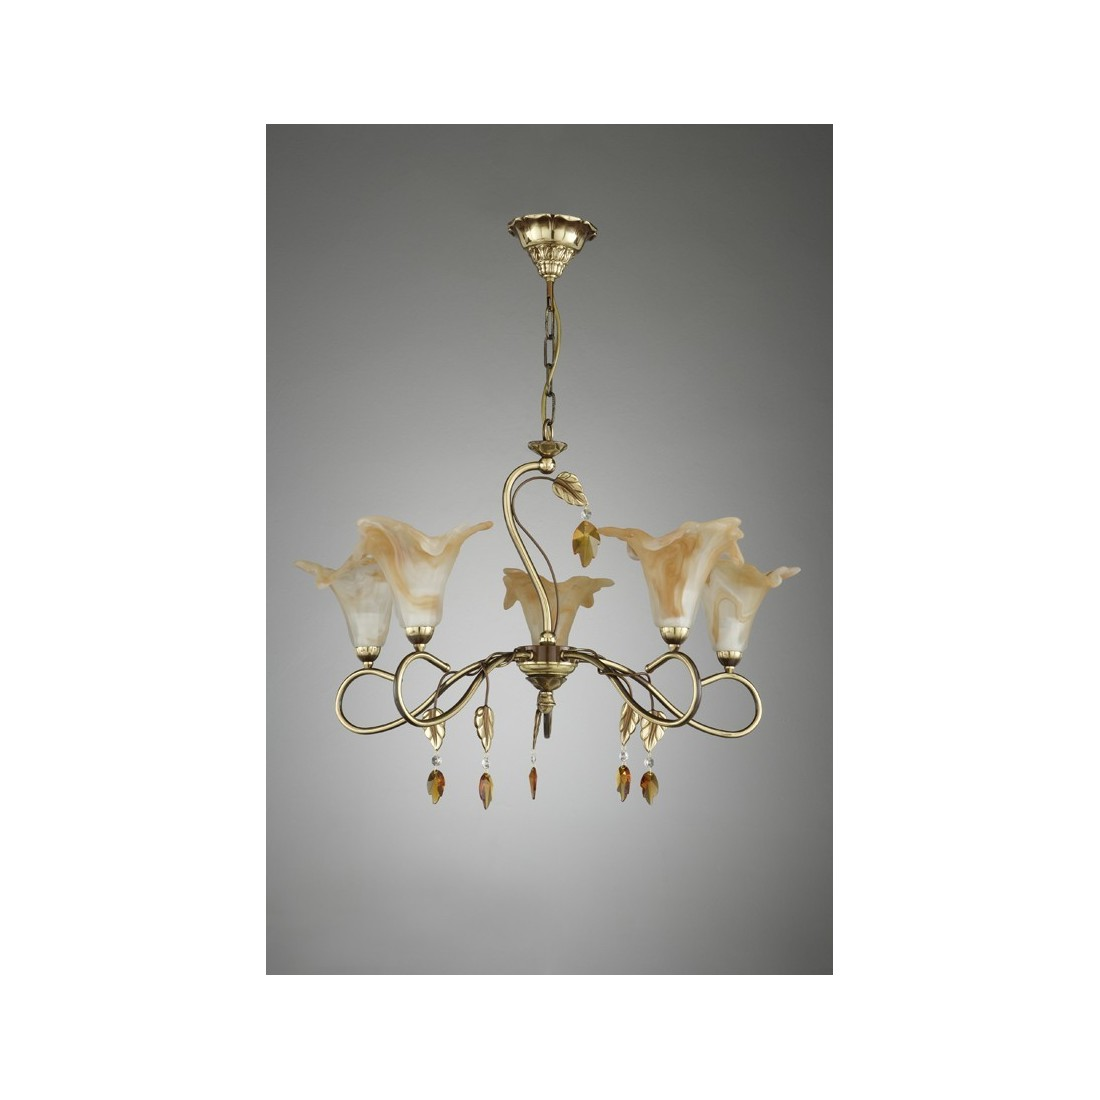 Iluminar viviendas cl sicas con l mparas de bronce de calidad - Lamparas clasicas modernas ...